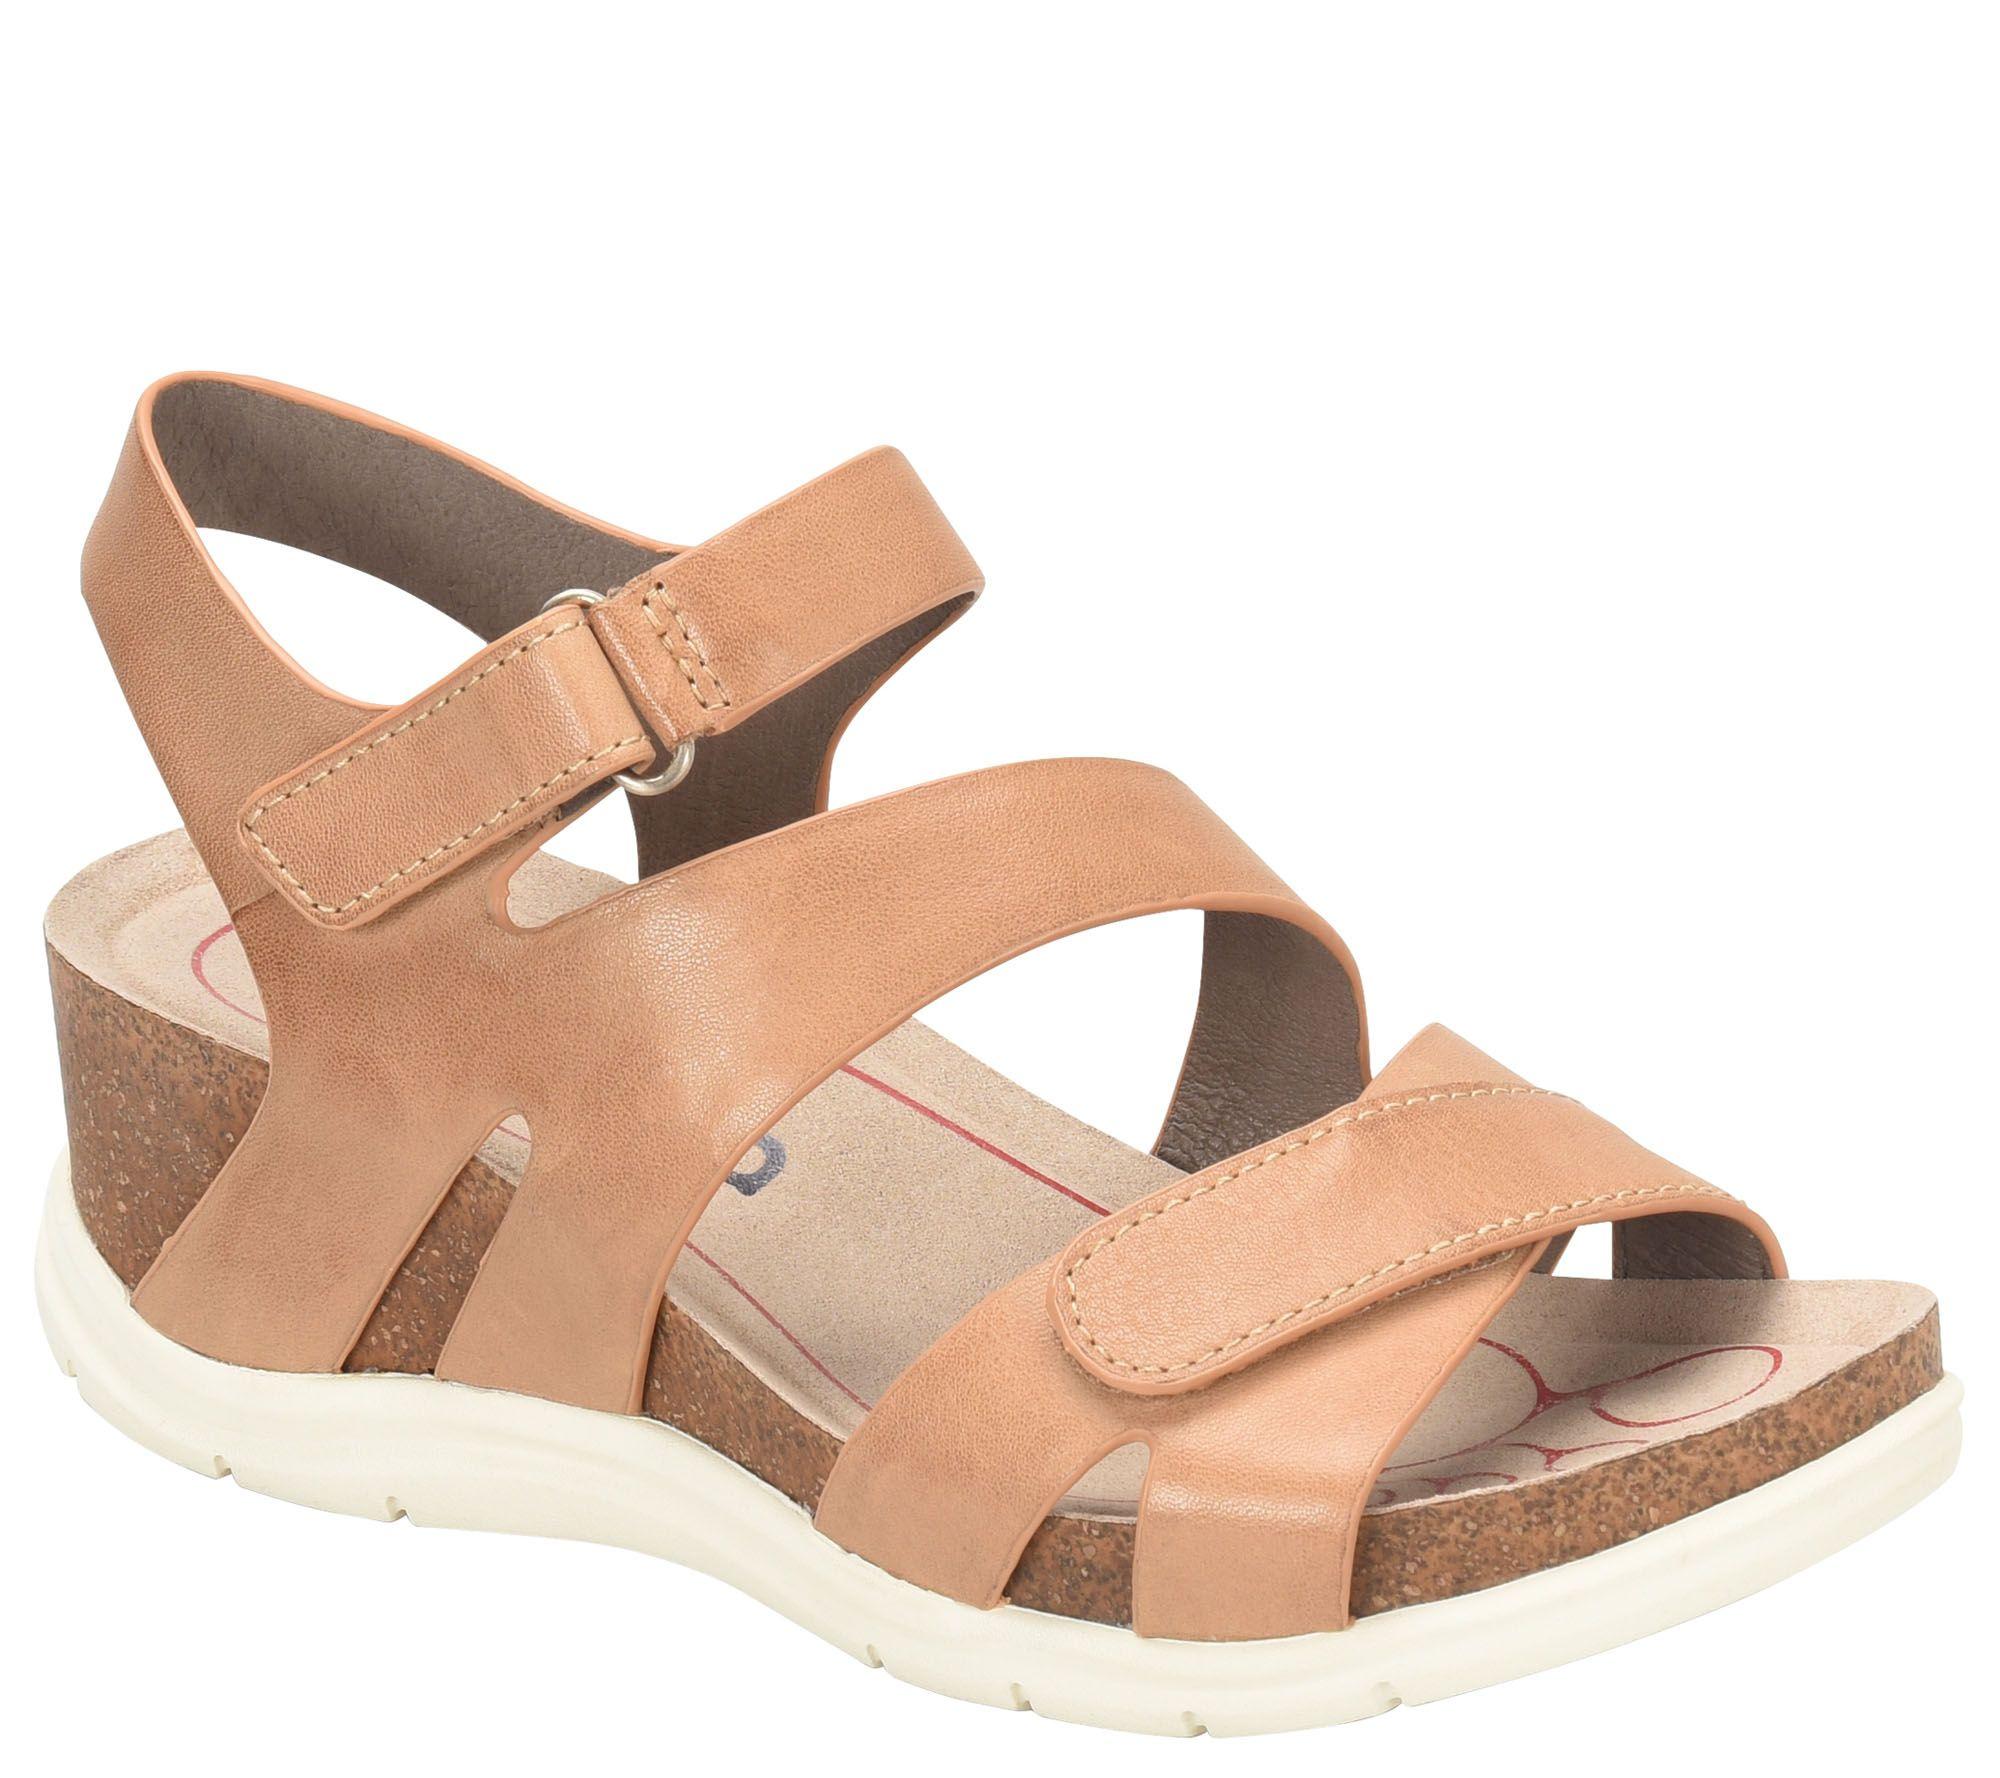 58e4c00f643108 Bionica Leather Sandals - Passion — QVC.com